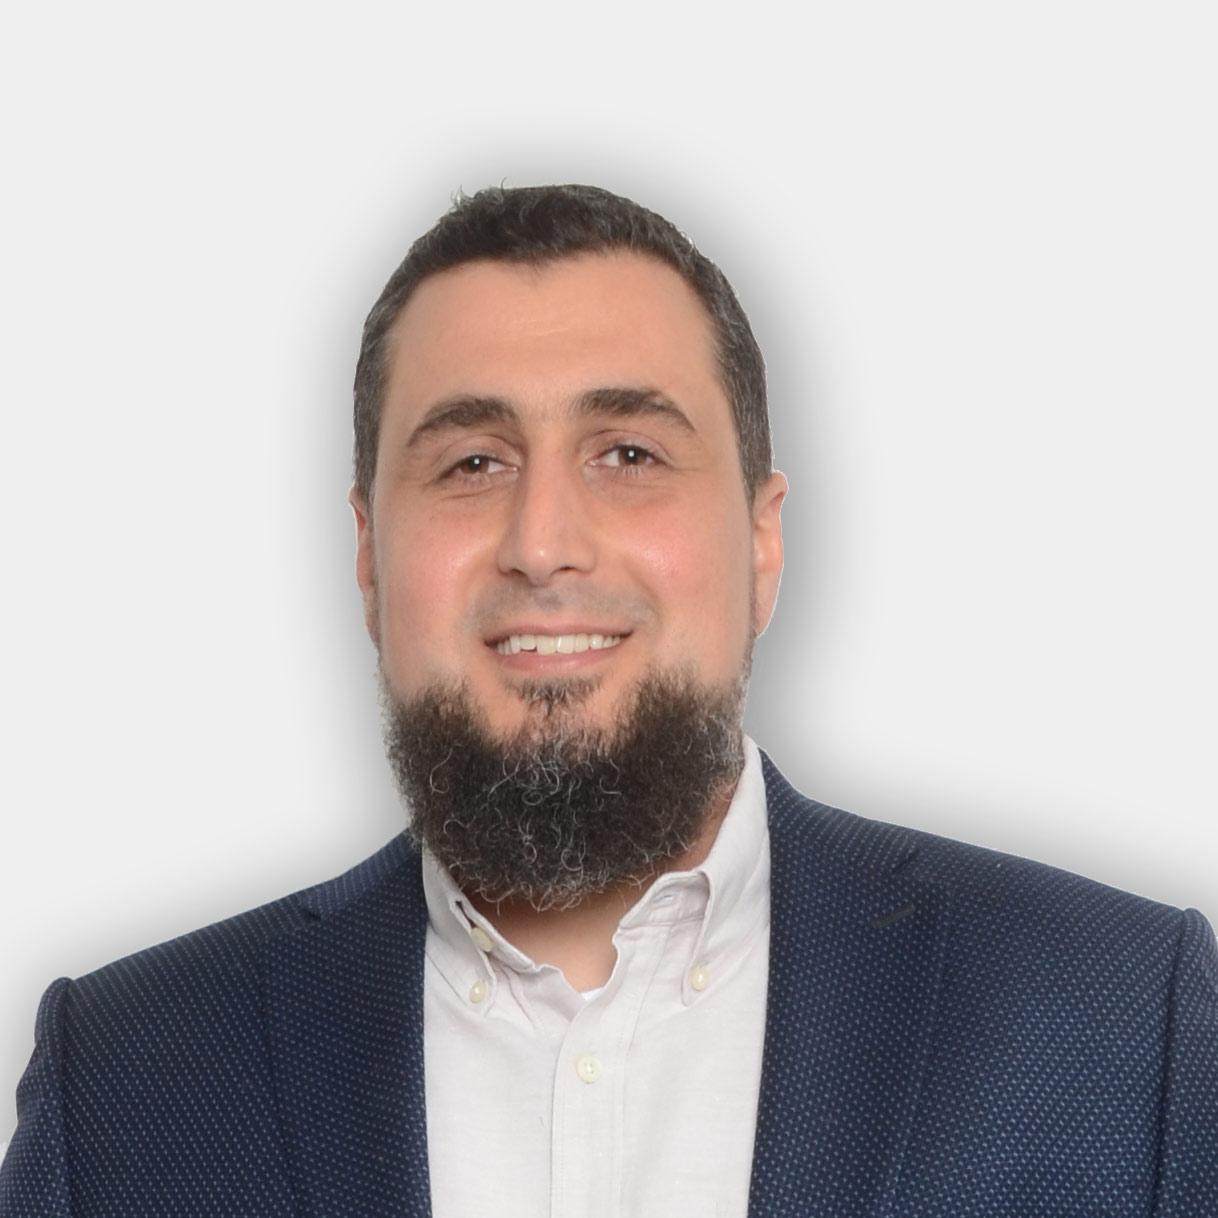 - Talal Ben Halim - Founder & CEO